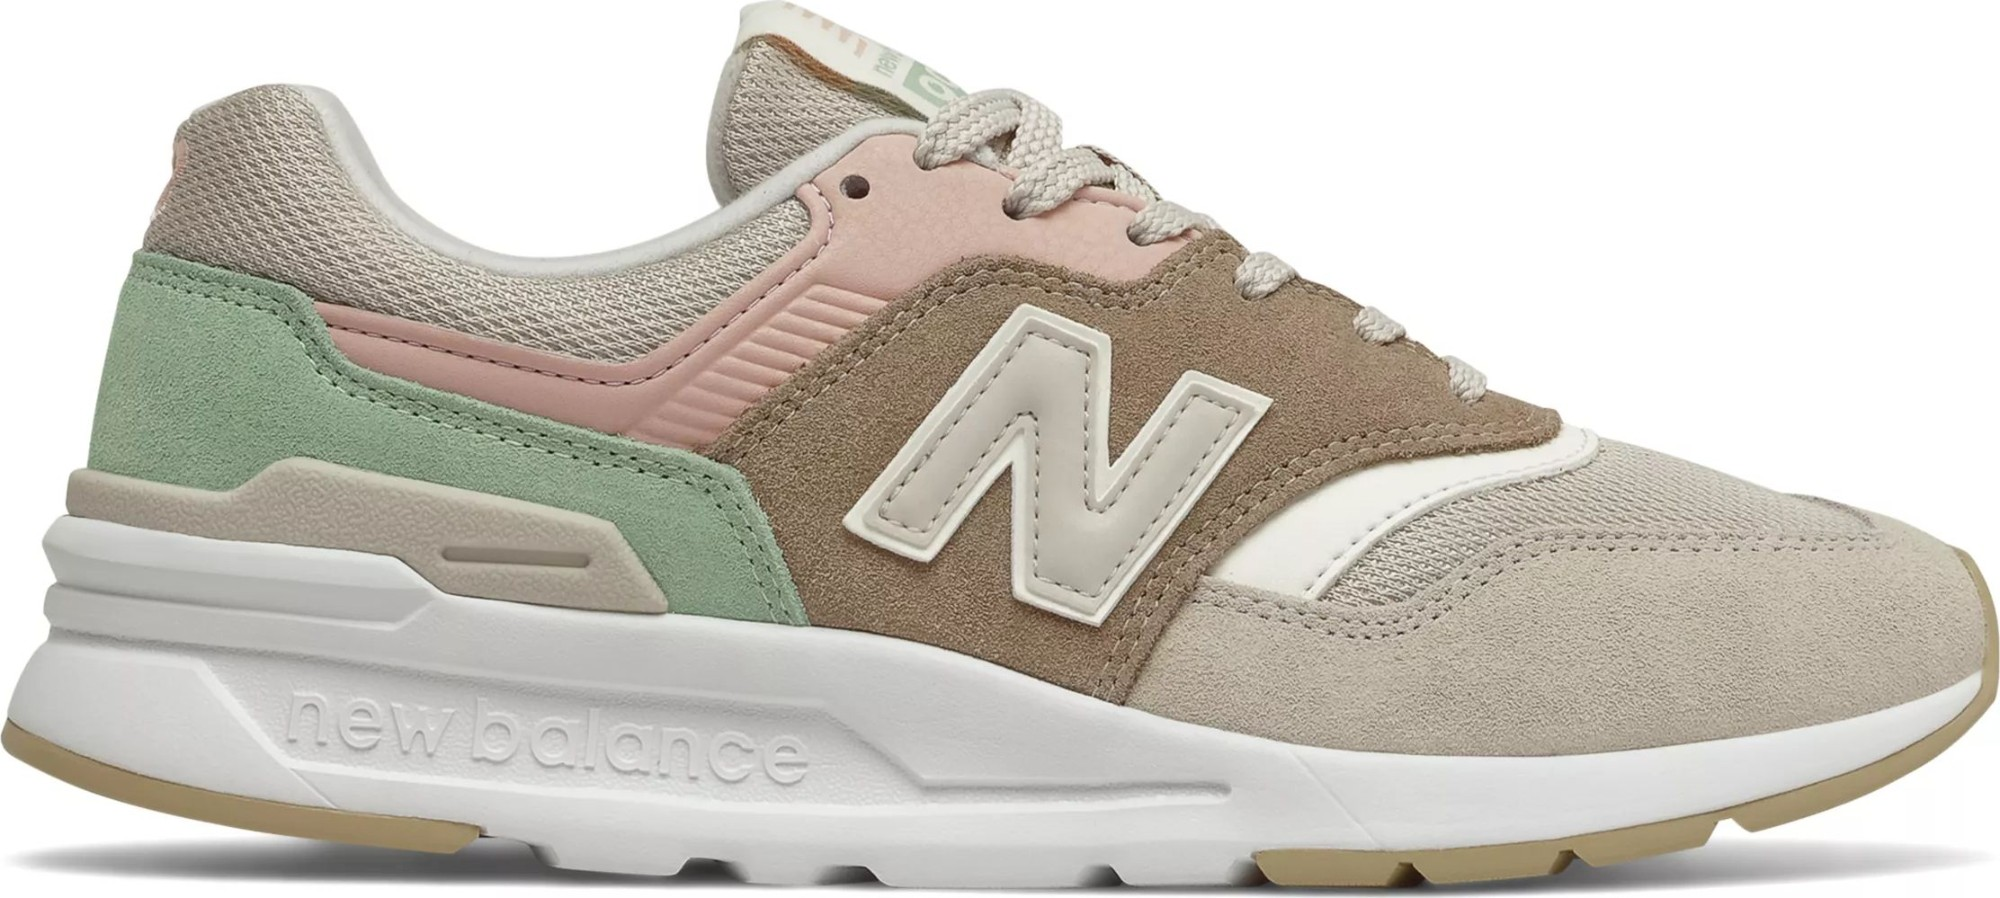 New Balance CW997 Tan 40